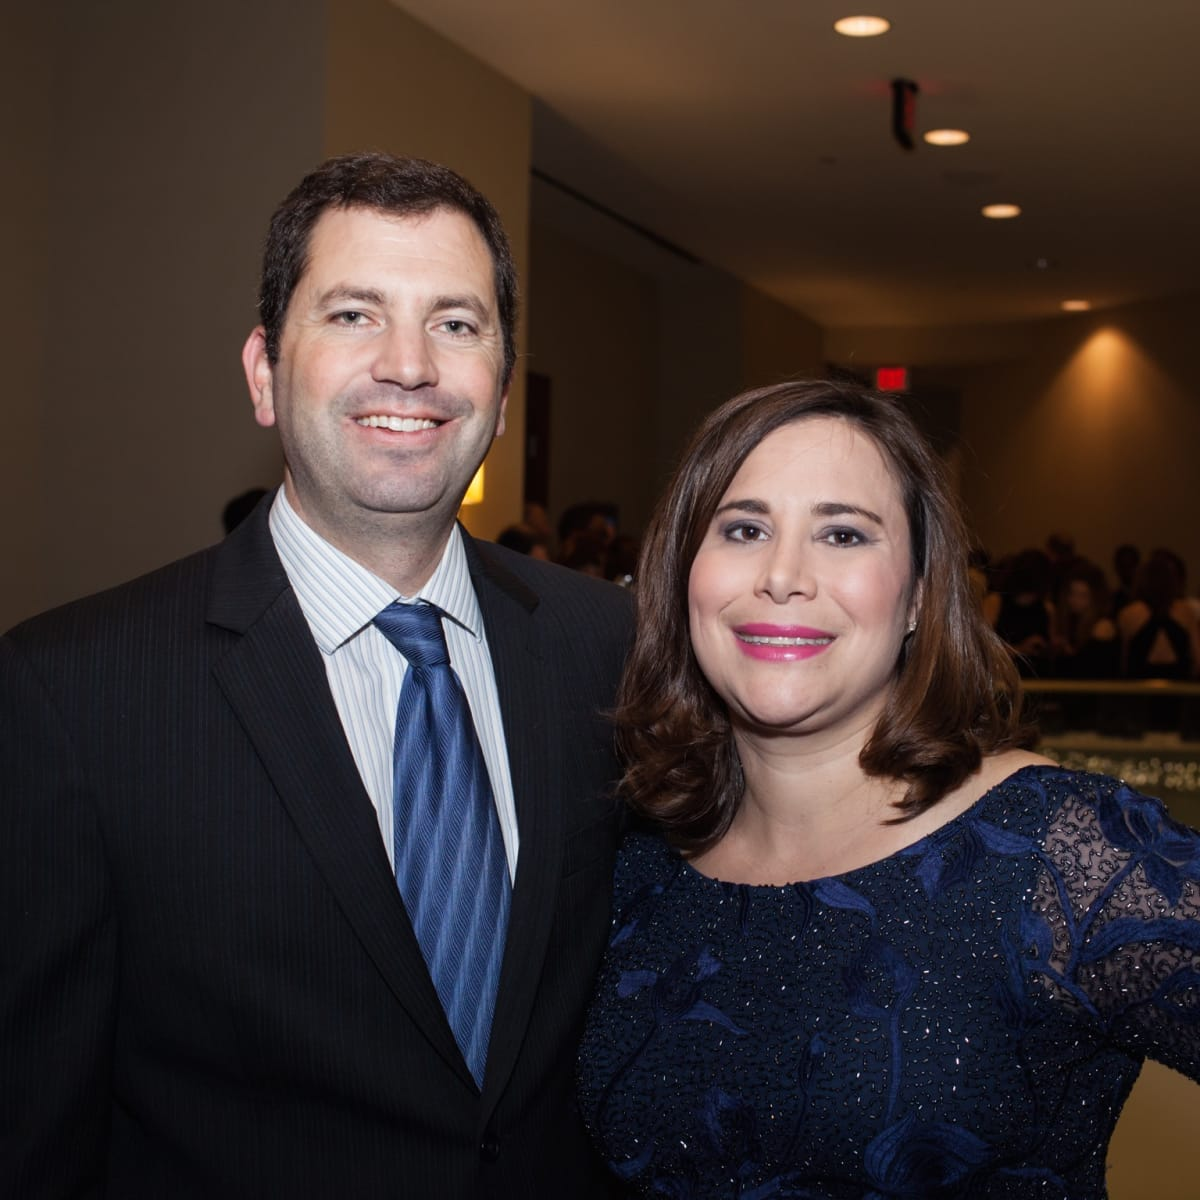 Mike and Jennifer Larsen, Elijah Rising auction co-chairs